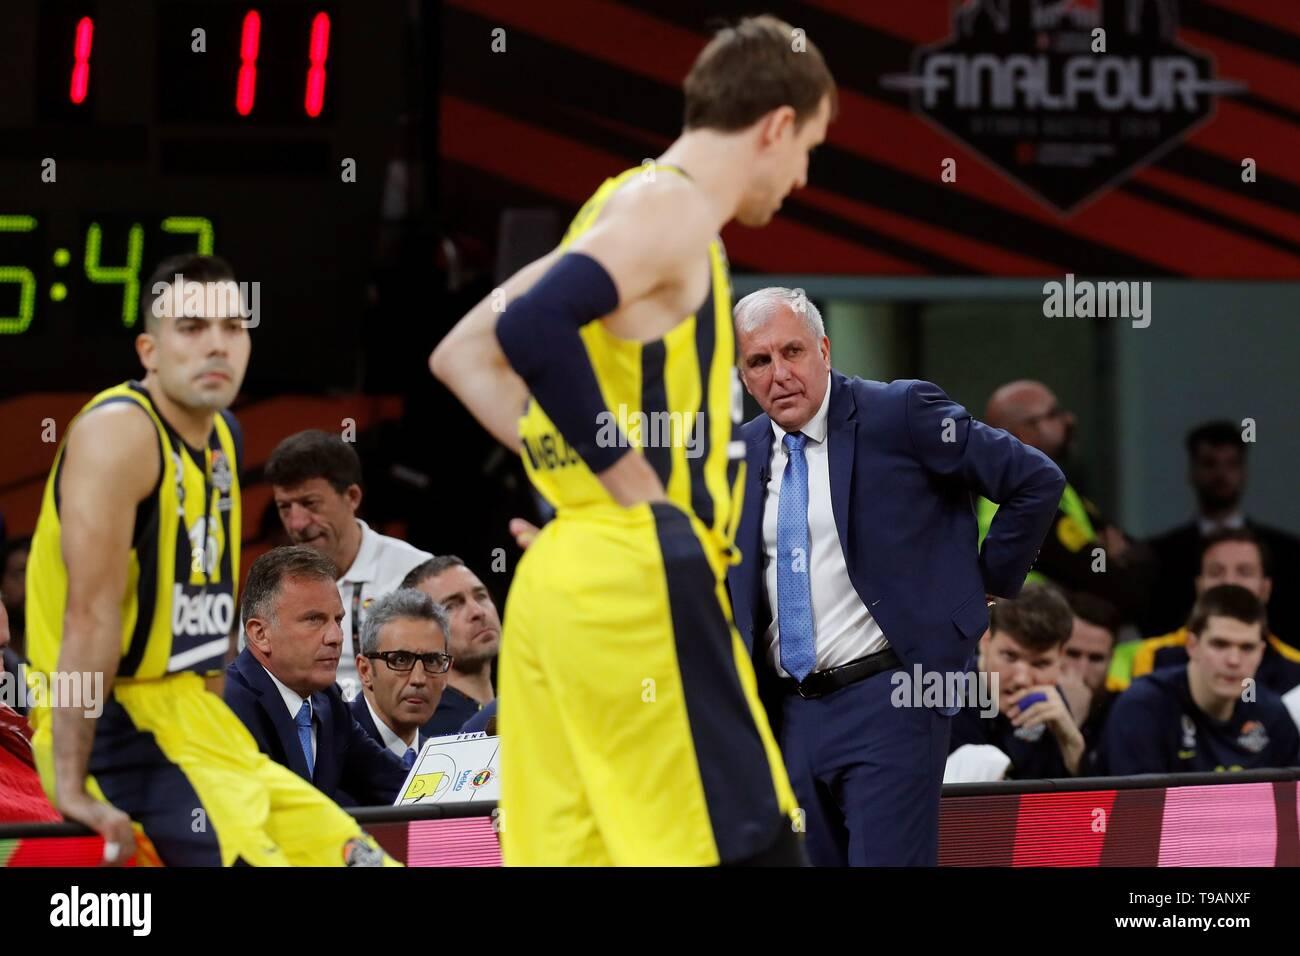 euroleague halbfinale 2019